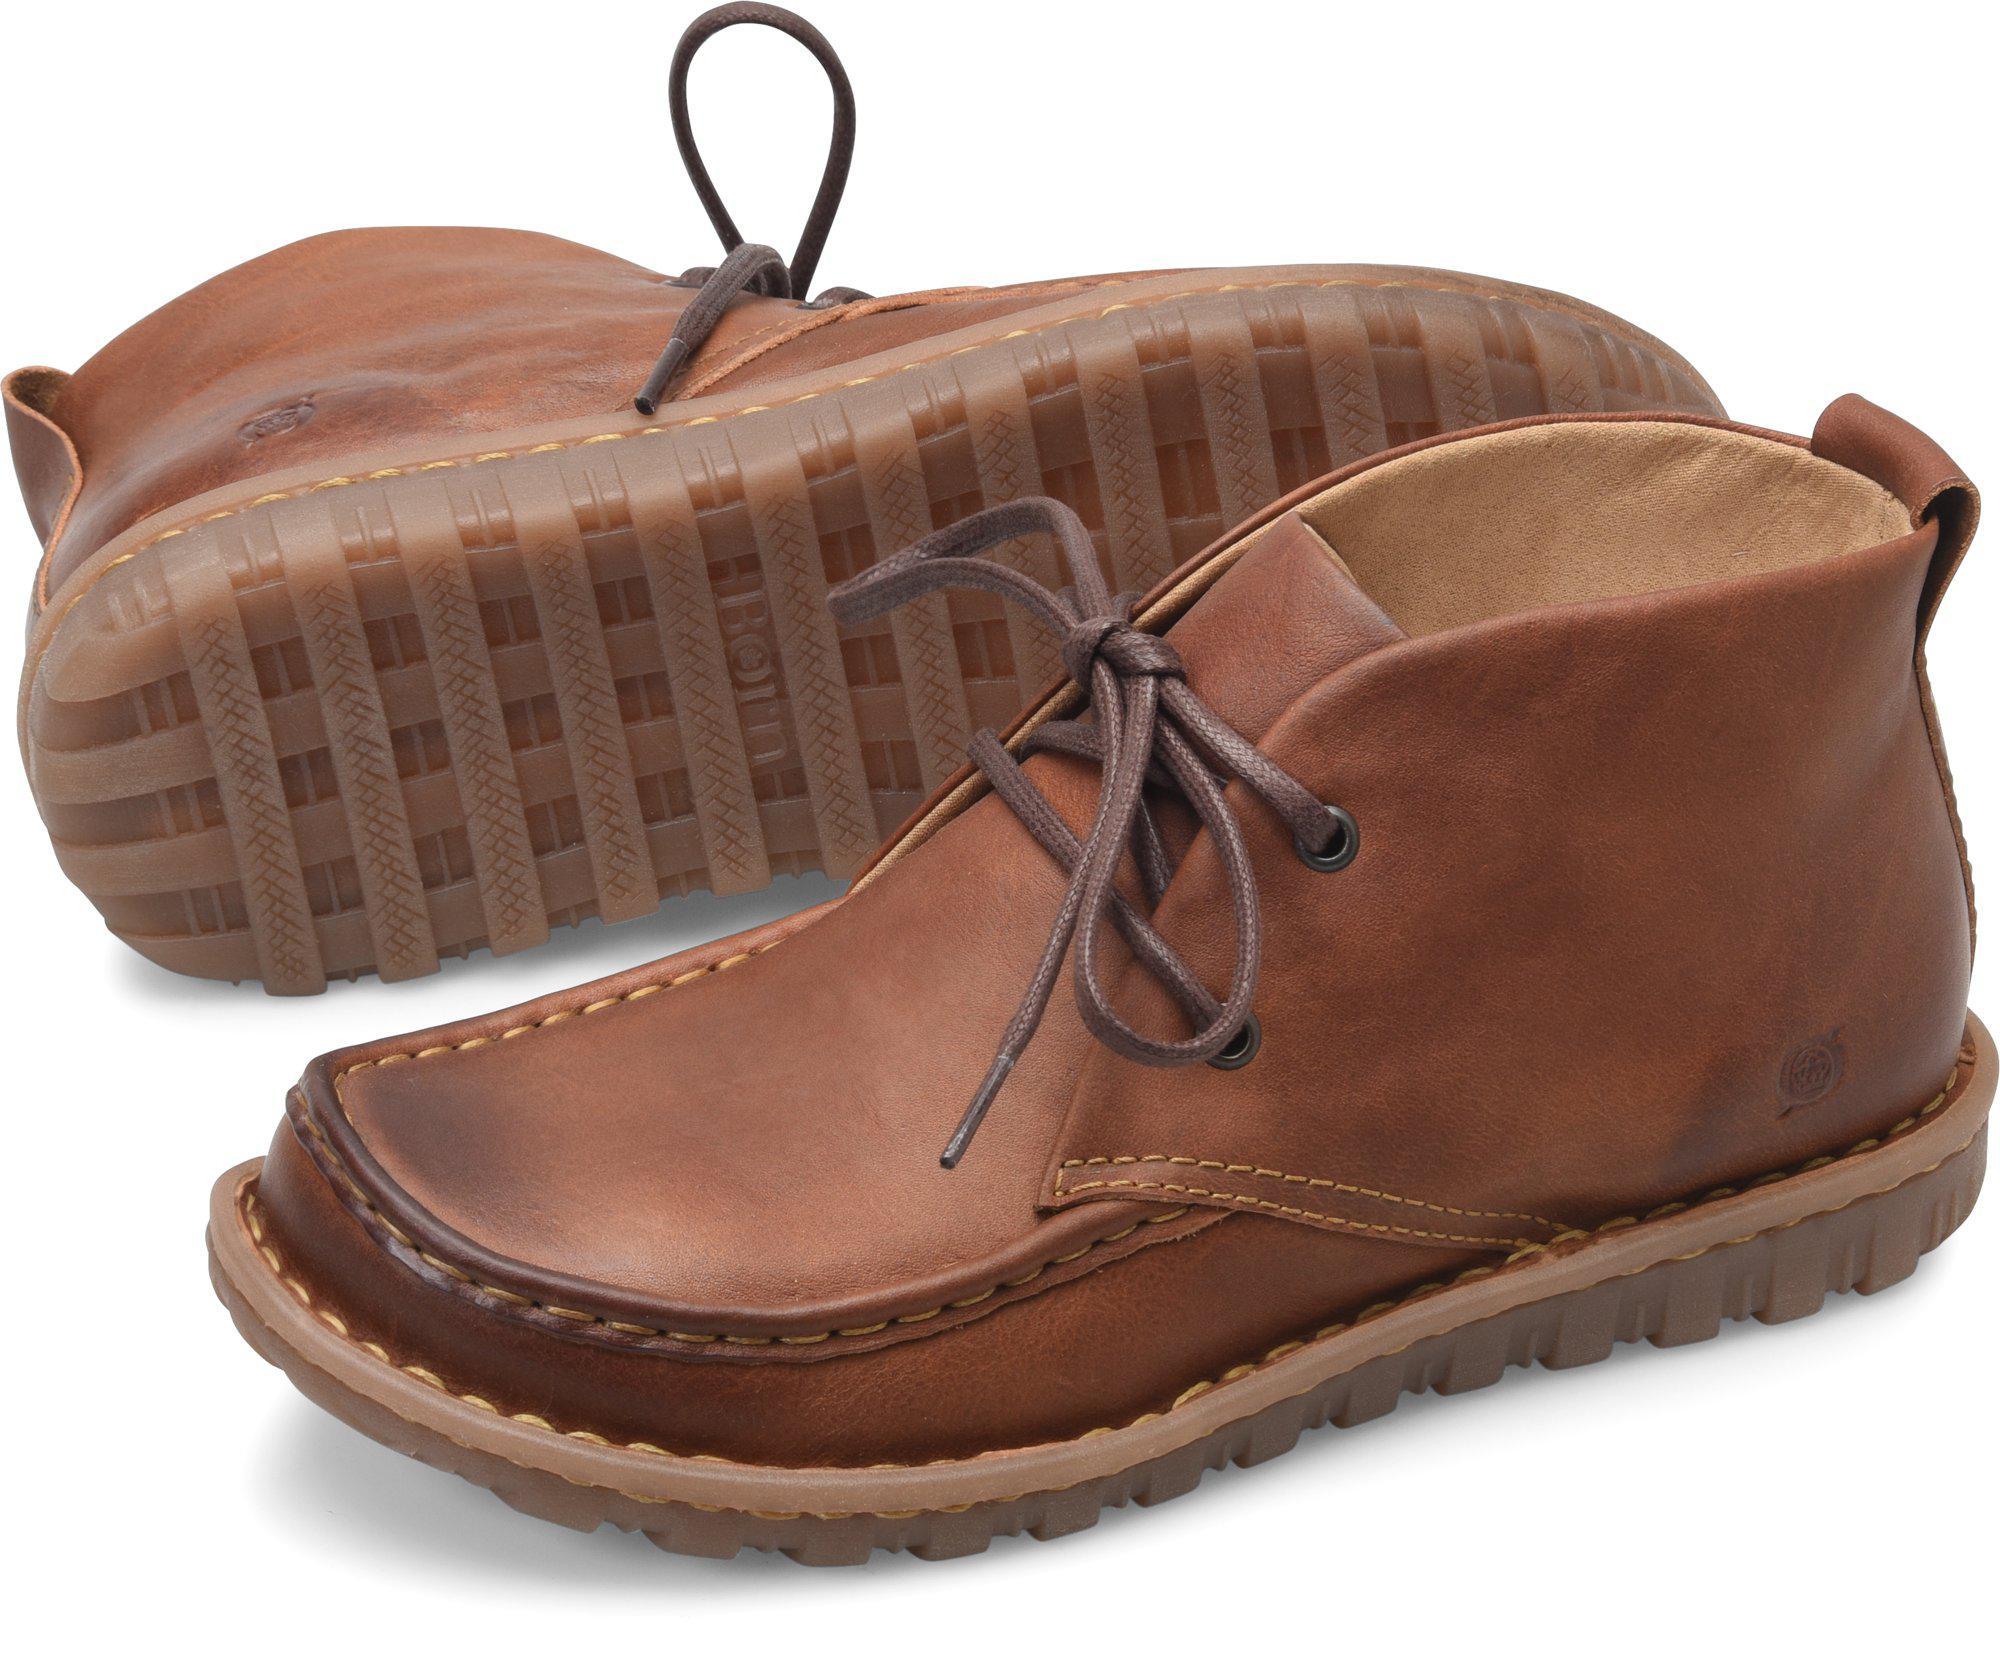 b4ebb2a72511e7 Lyst Børn Glenwood In Brown For Men. Doll Pink Born Shoes ...